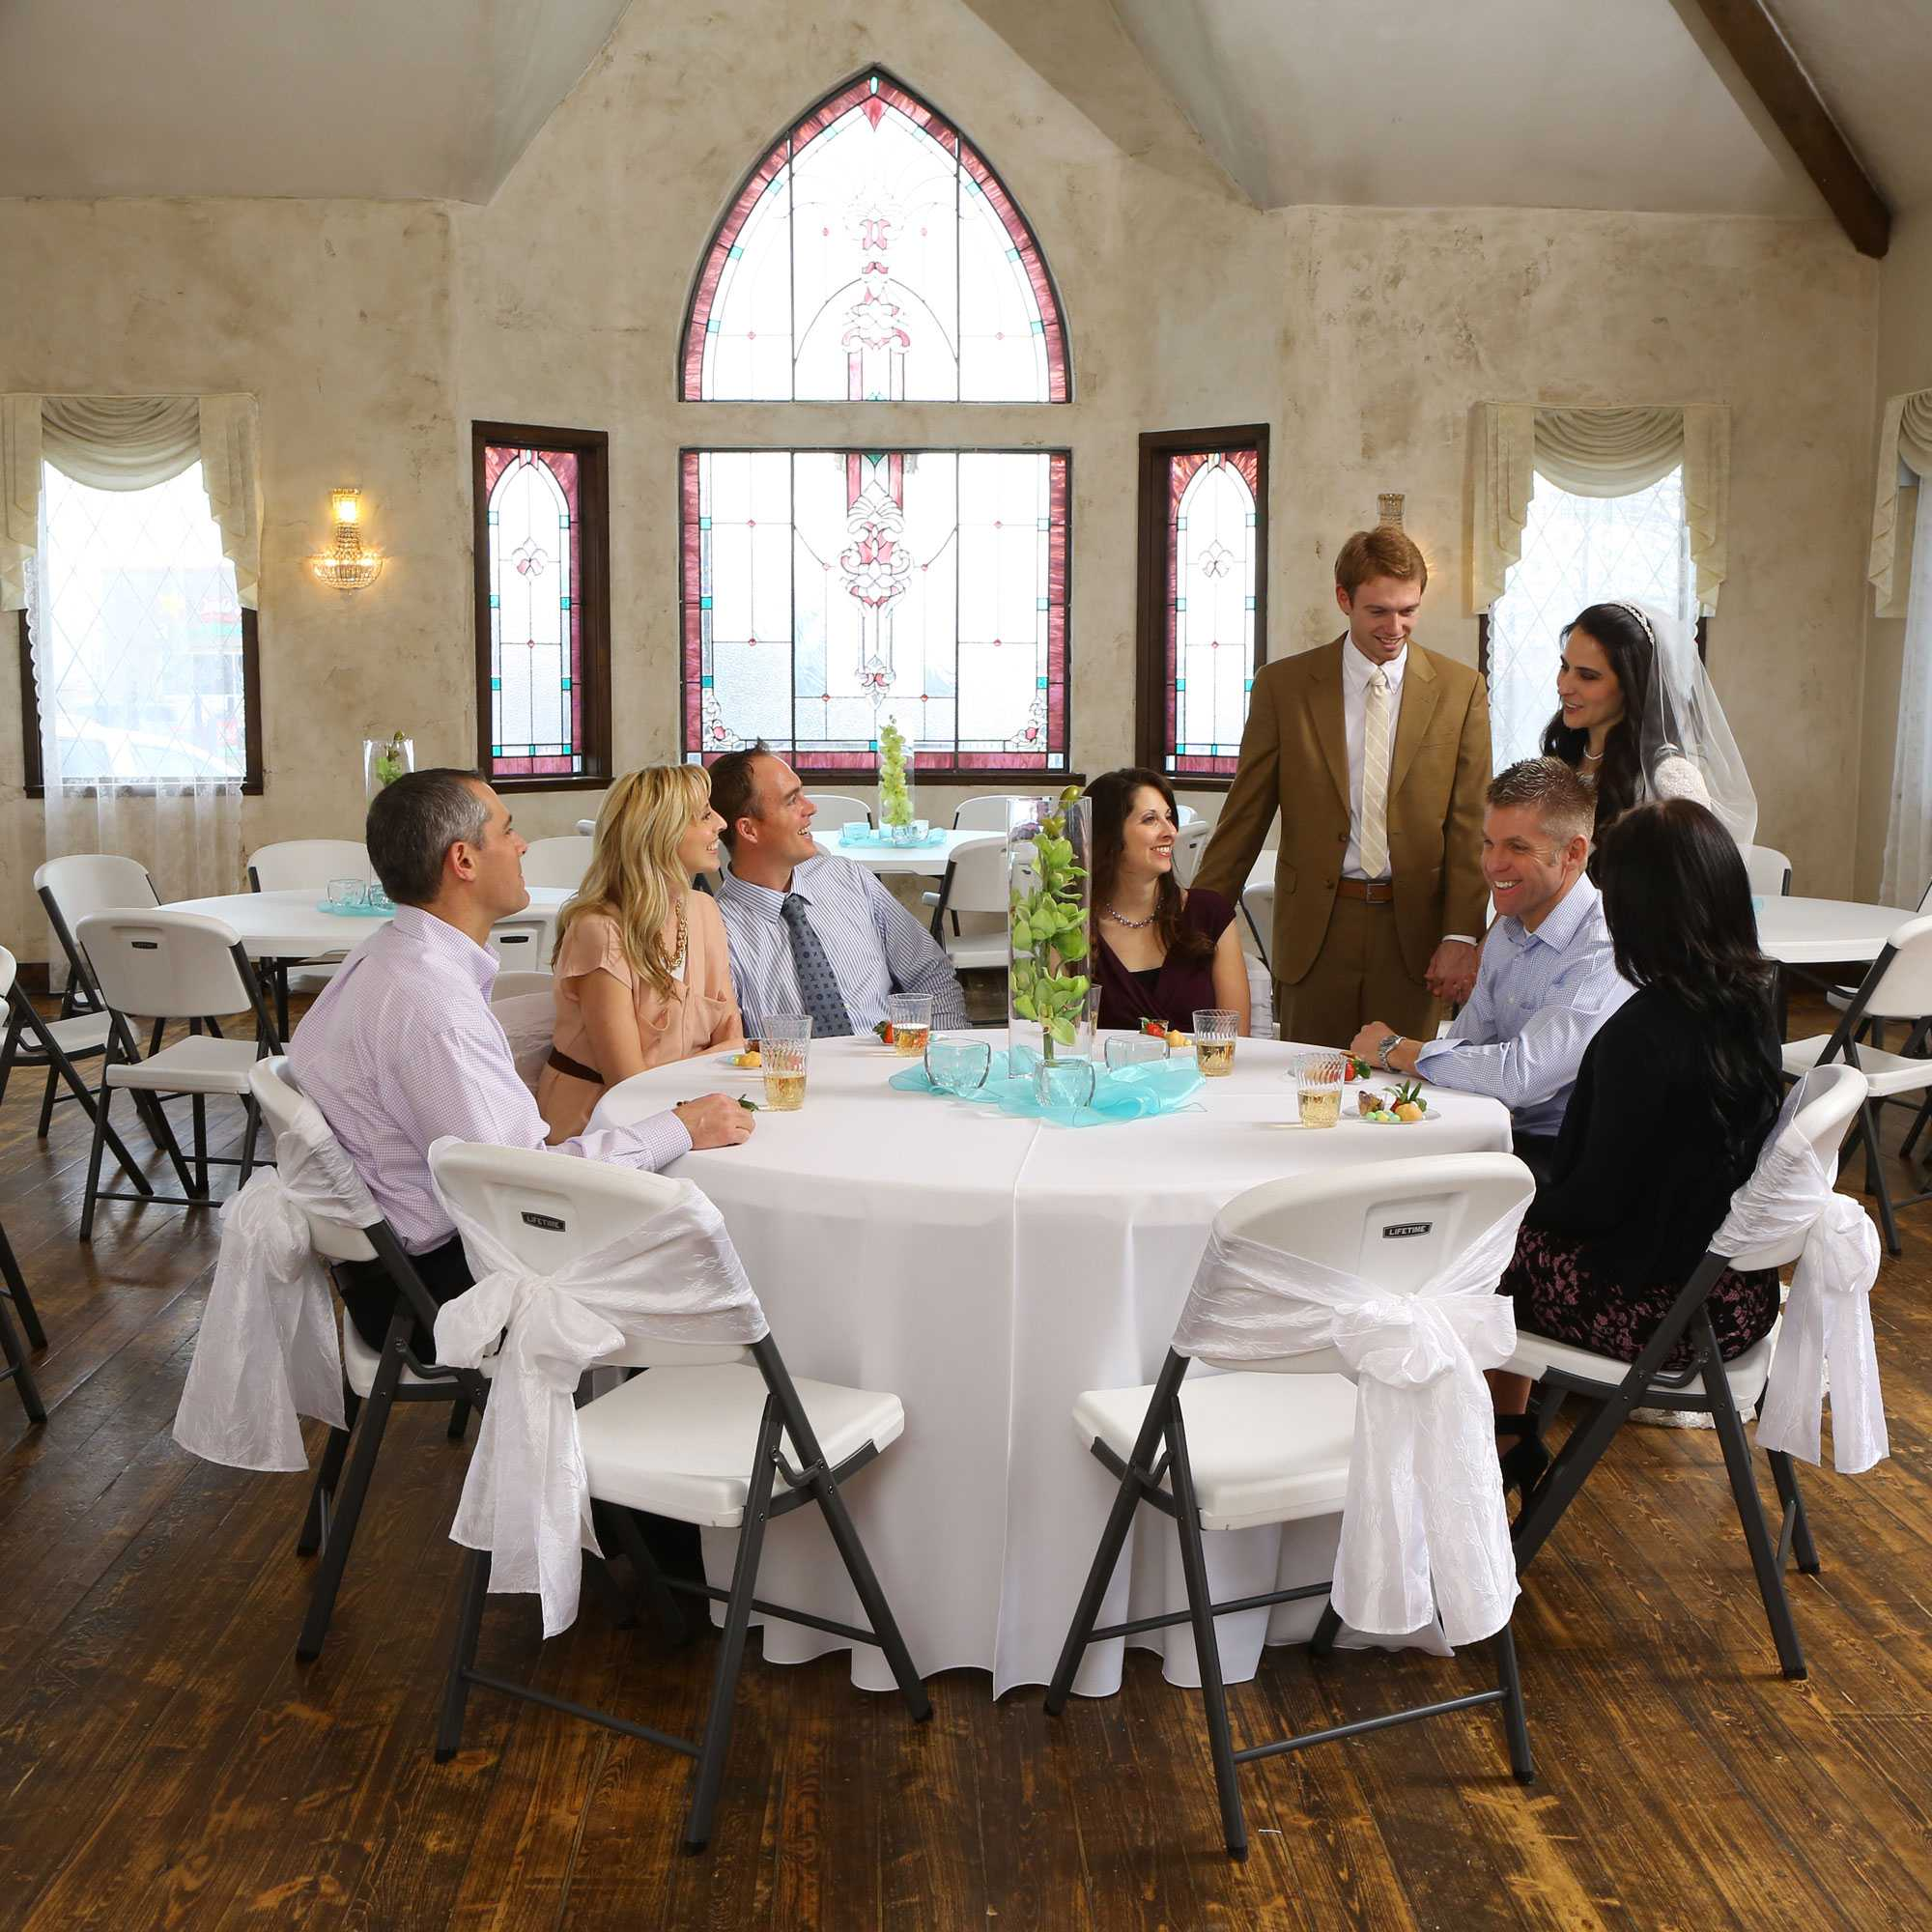 Lifetime 280435 Almond Color 60 Quot Round Banquet Table For